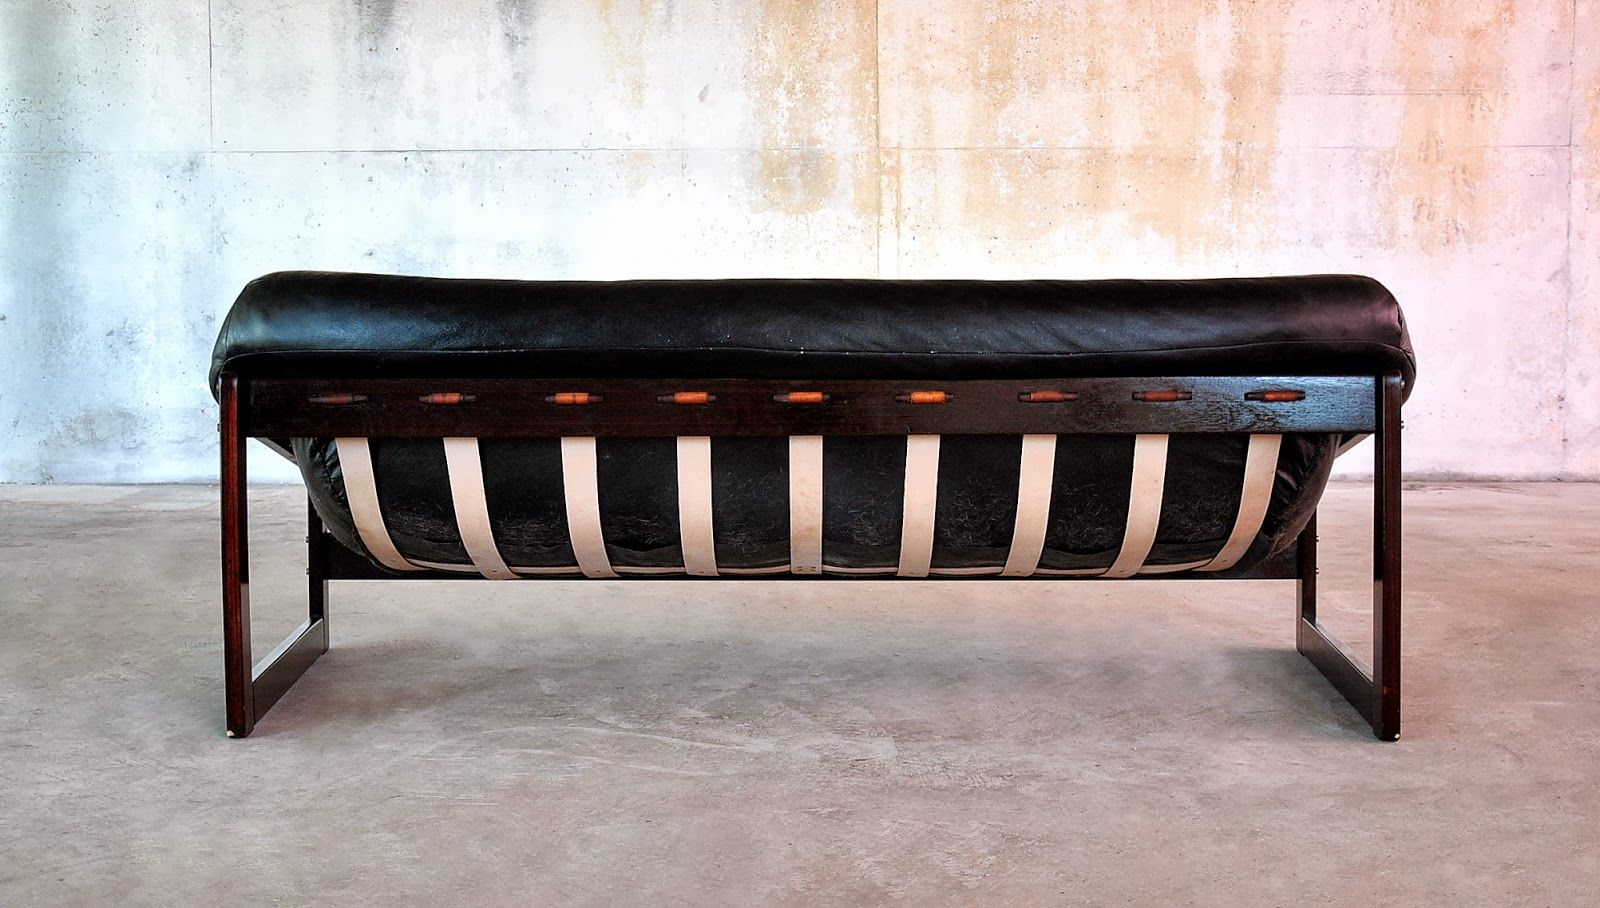 Chesterfield Palisanderholz Sofa mit braunem Lederbezug ...